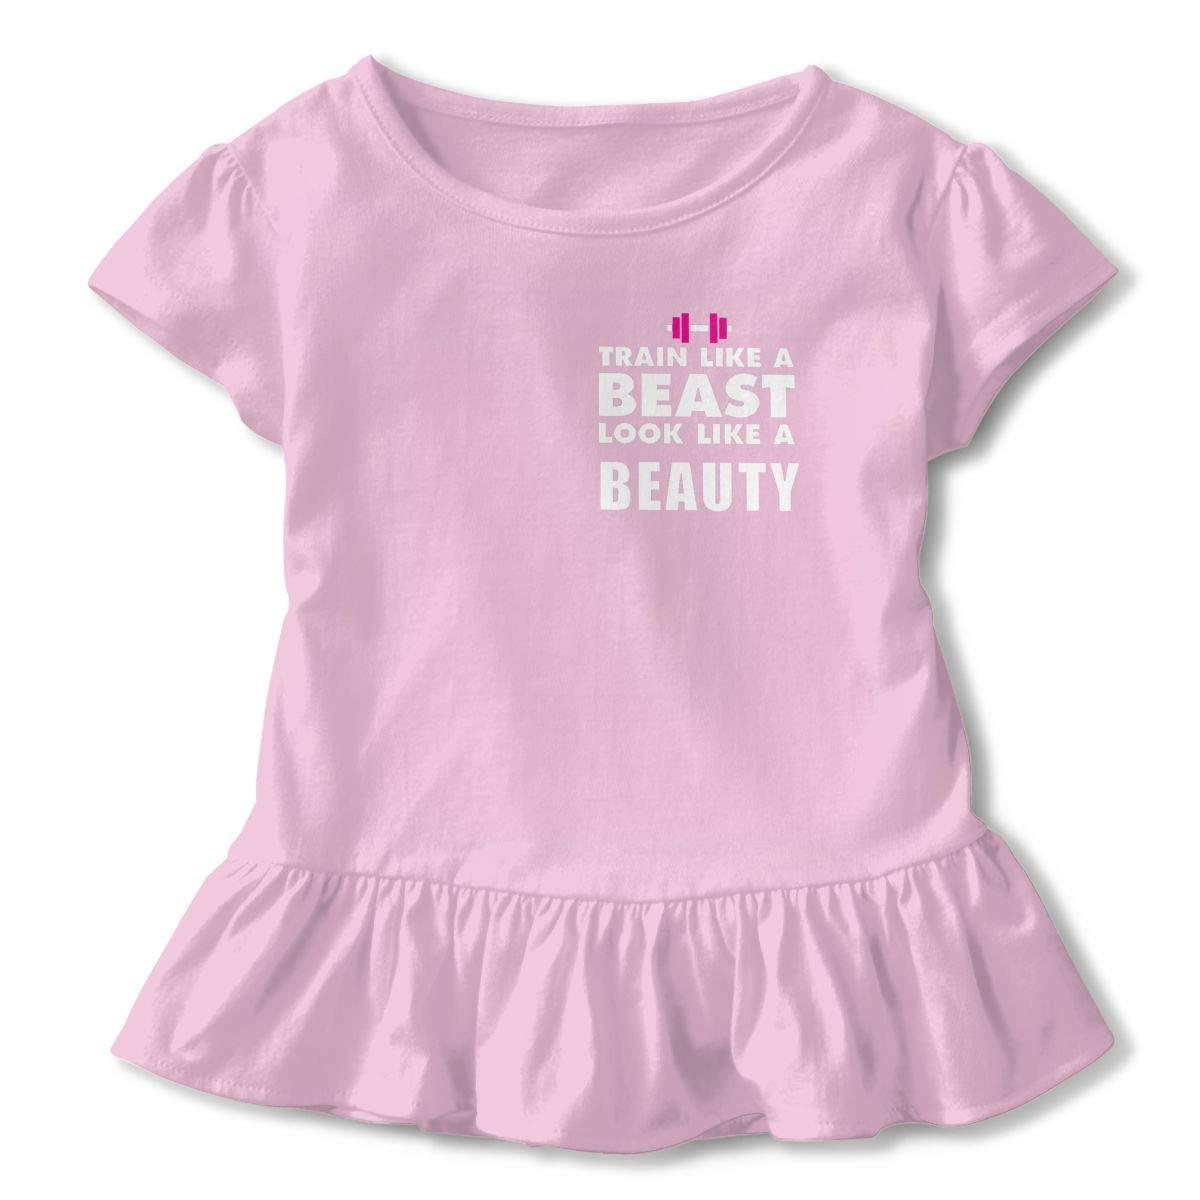 QUZtww Train Like A Beast Look Like A Beauty Cute Toddler Kids Girls Short Sleeves Shirts Ruffles for Daily Wear Party School